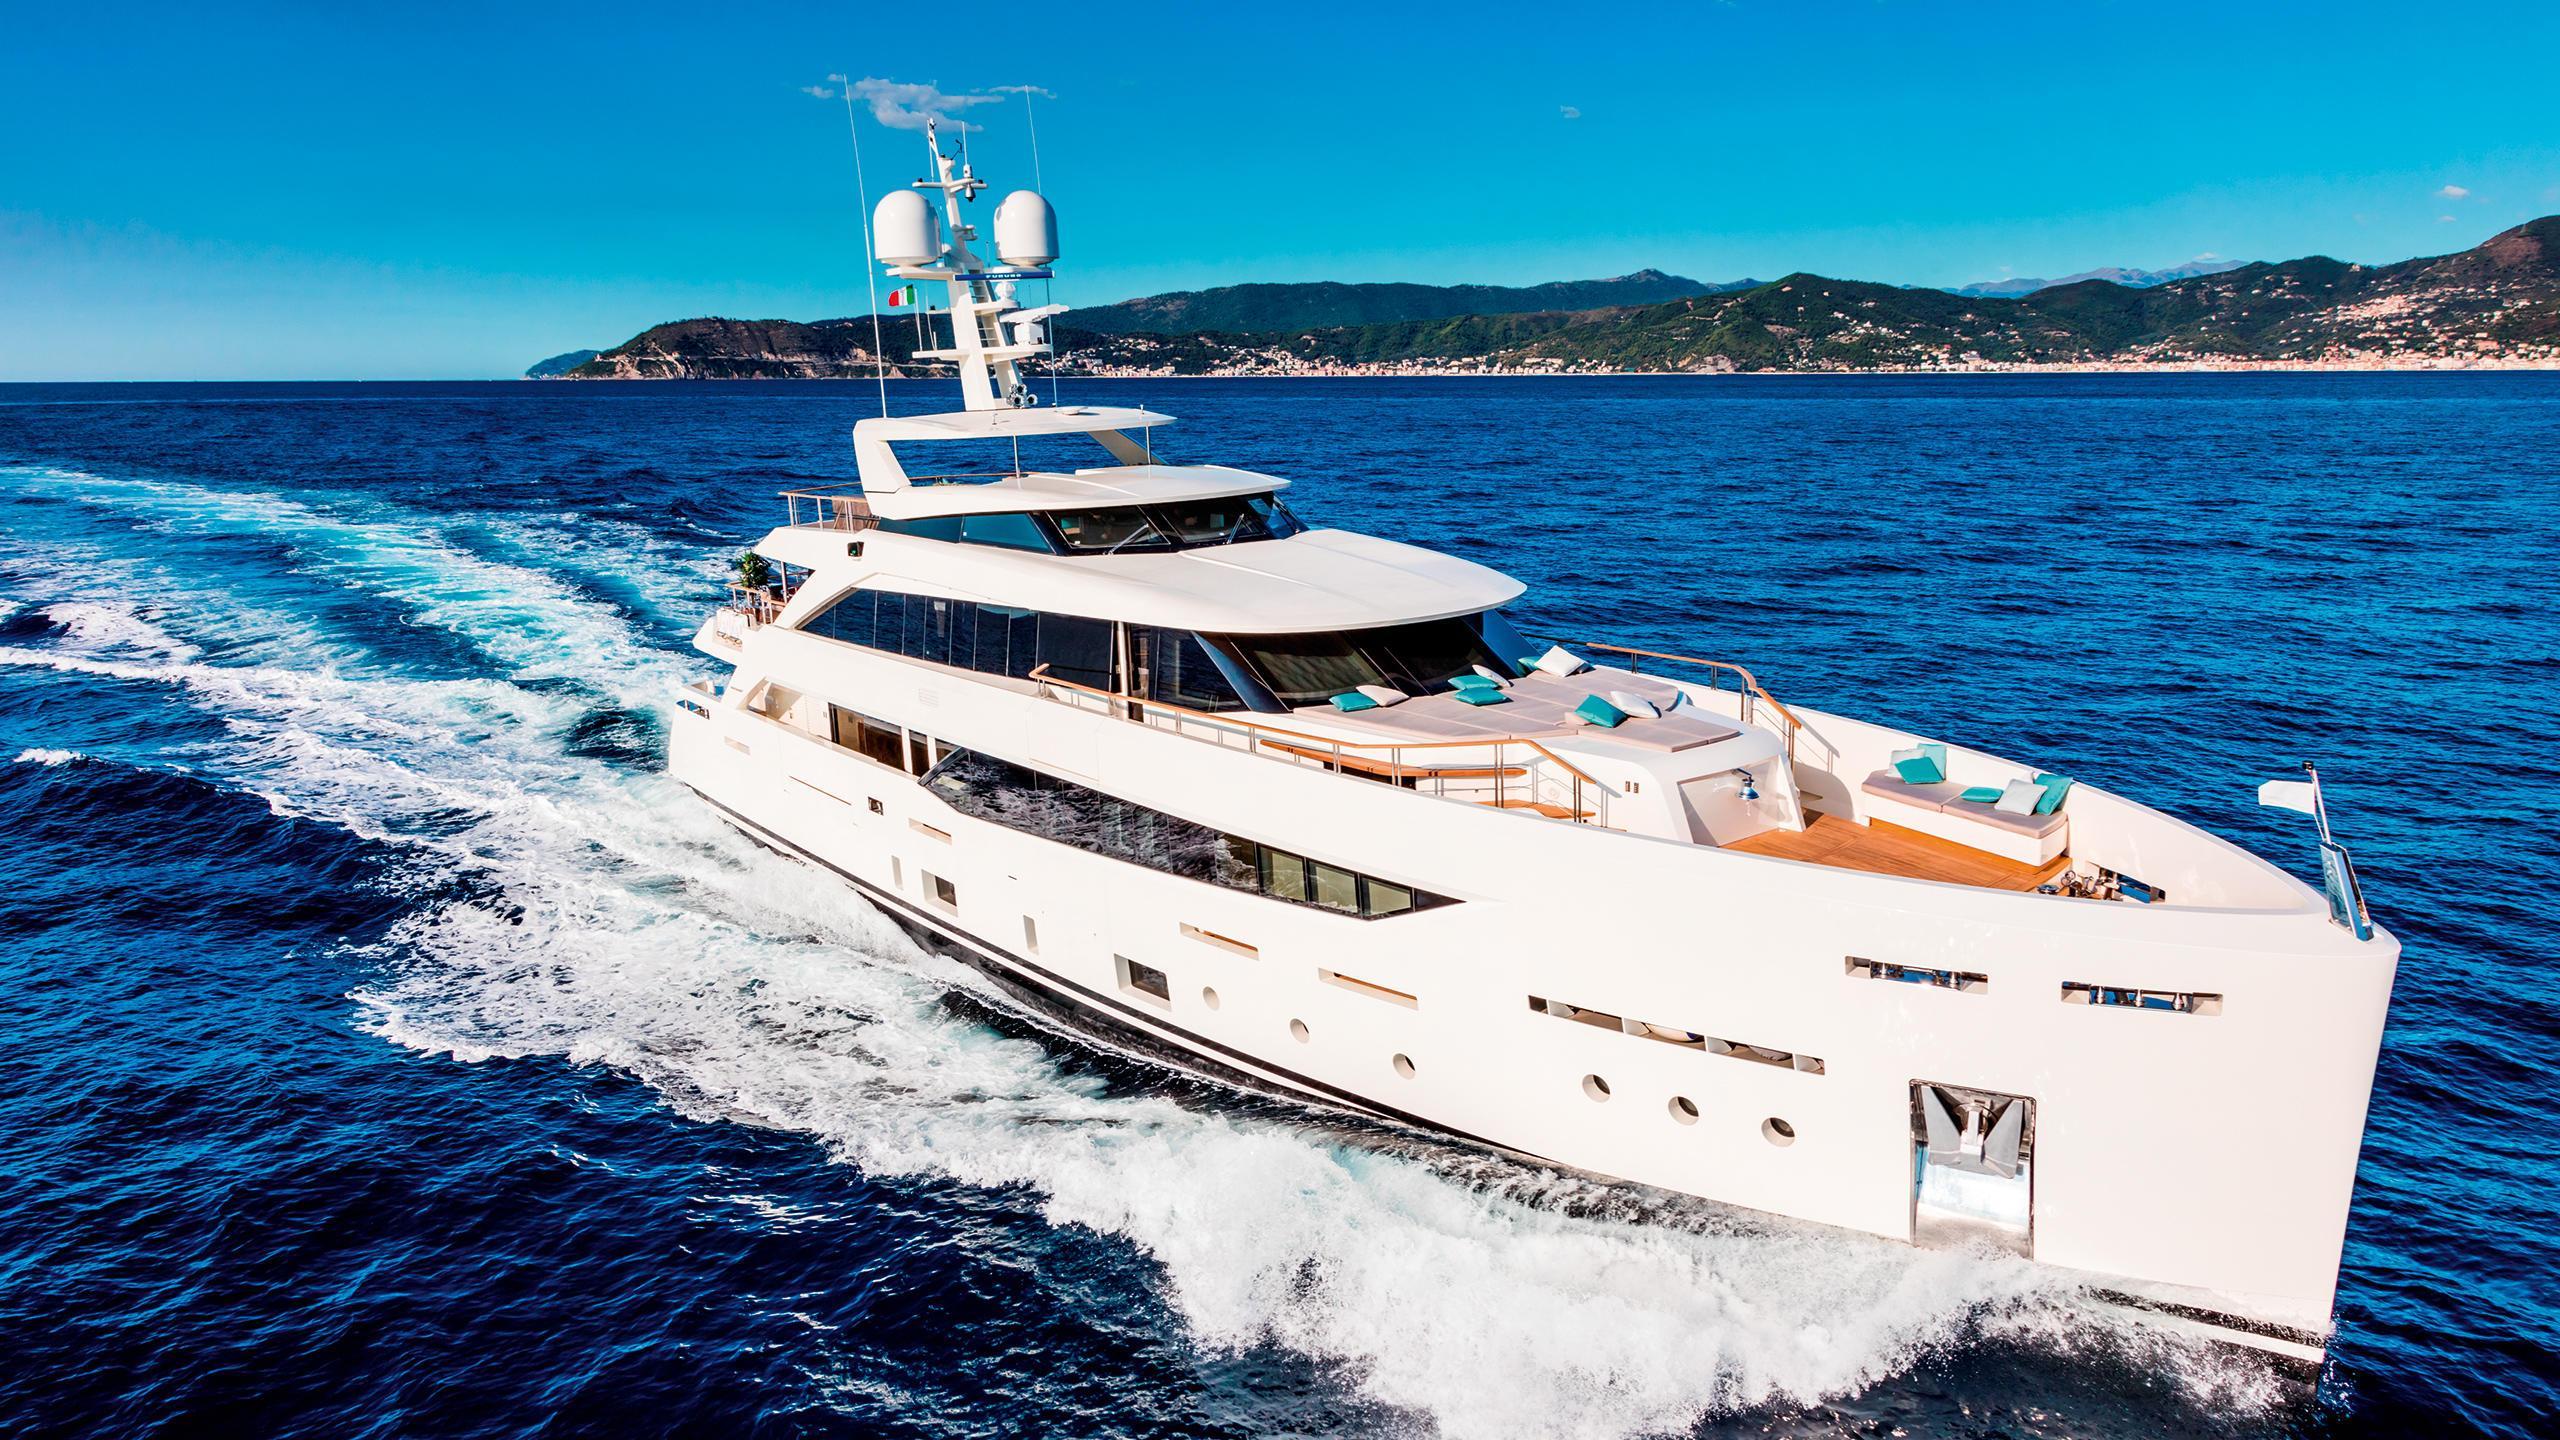 serenity-motor-yacht-mondomarine-2015-42m-cruising-front-profile